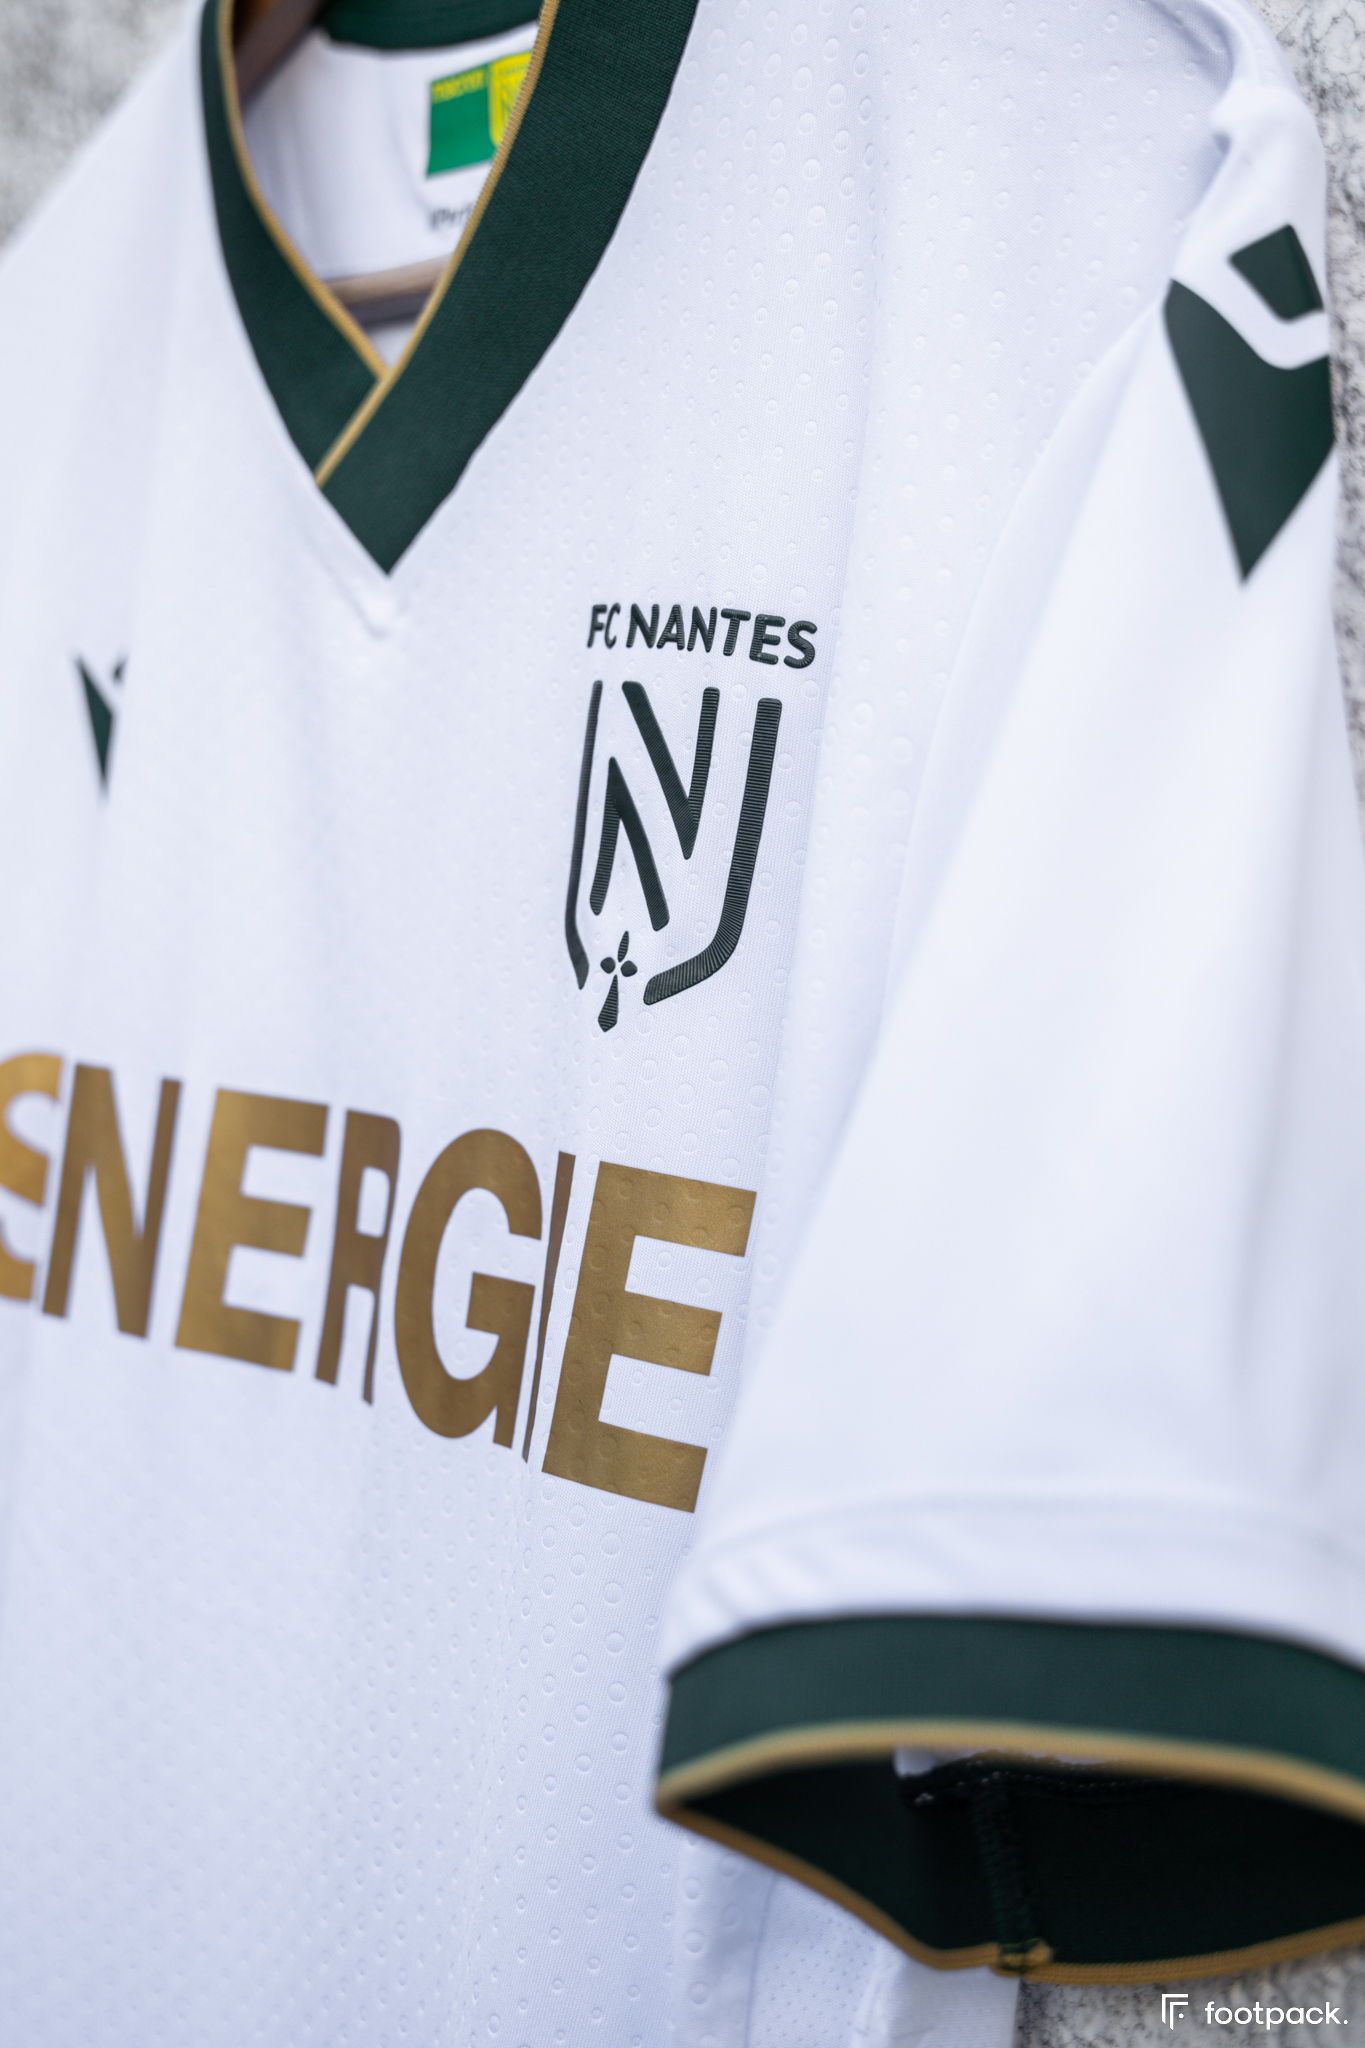 Maillot FC Nantes 2021-2022 exterieur Macron - footpack.